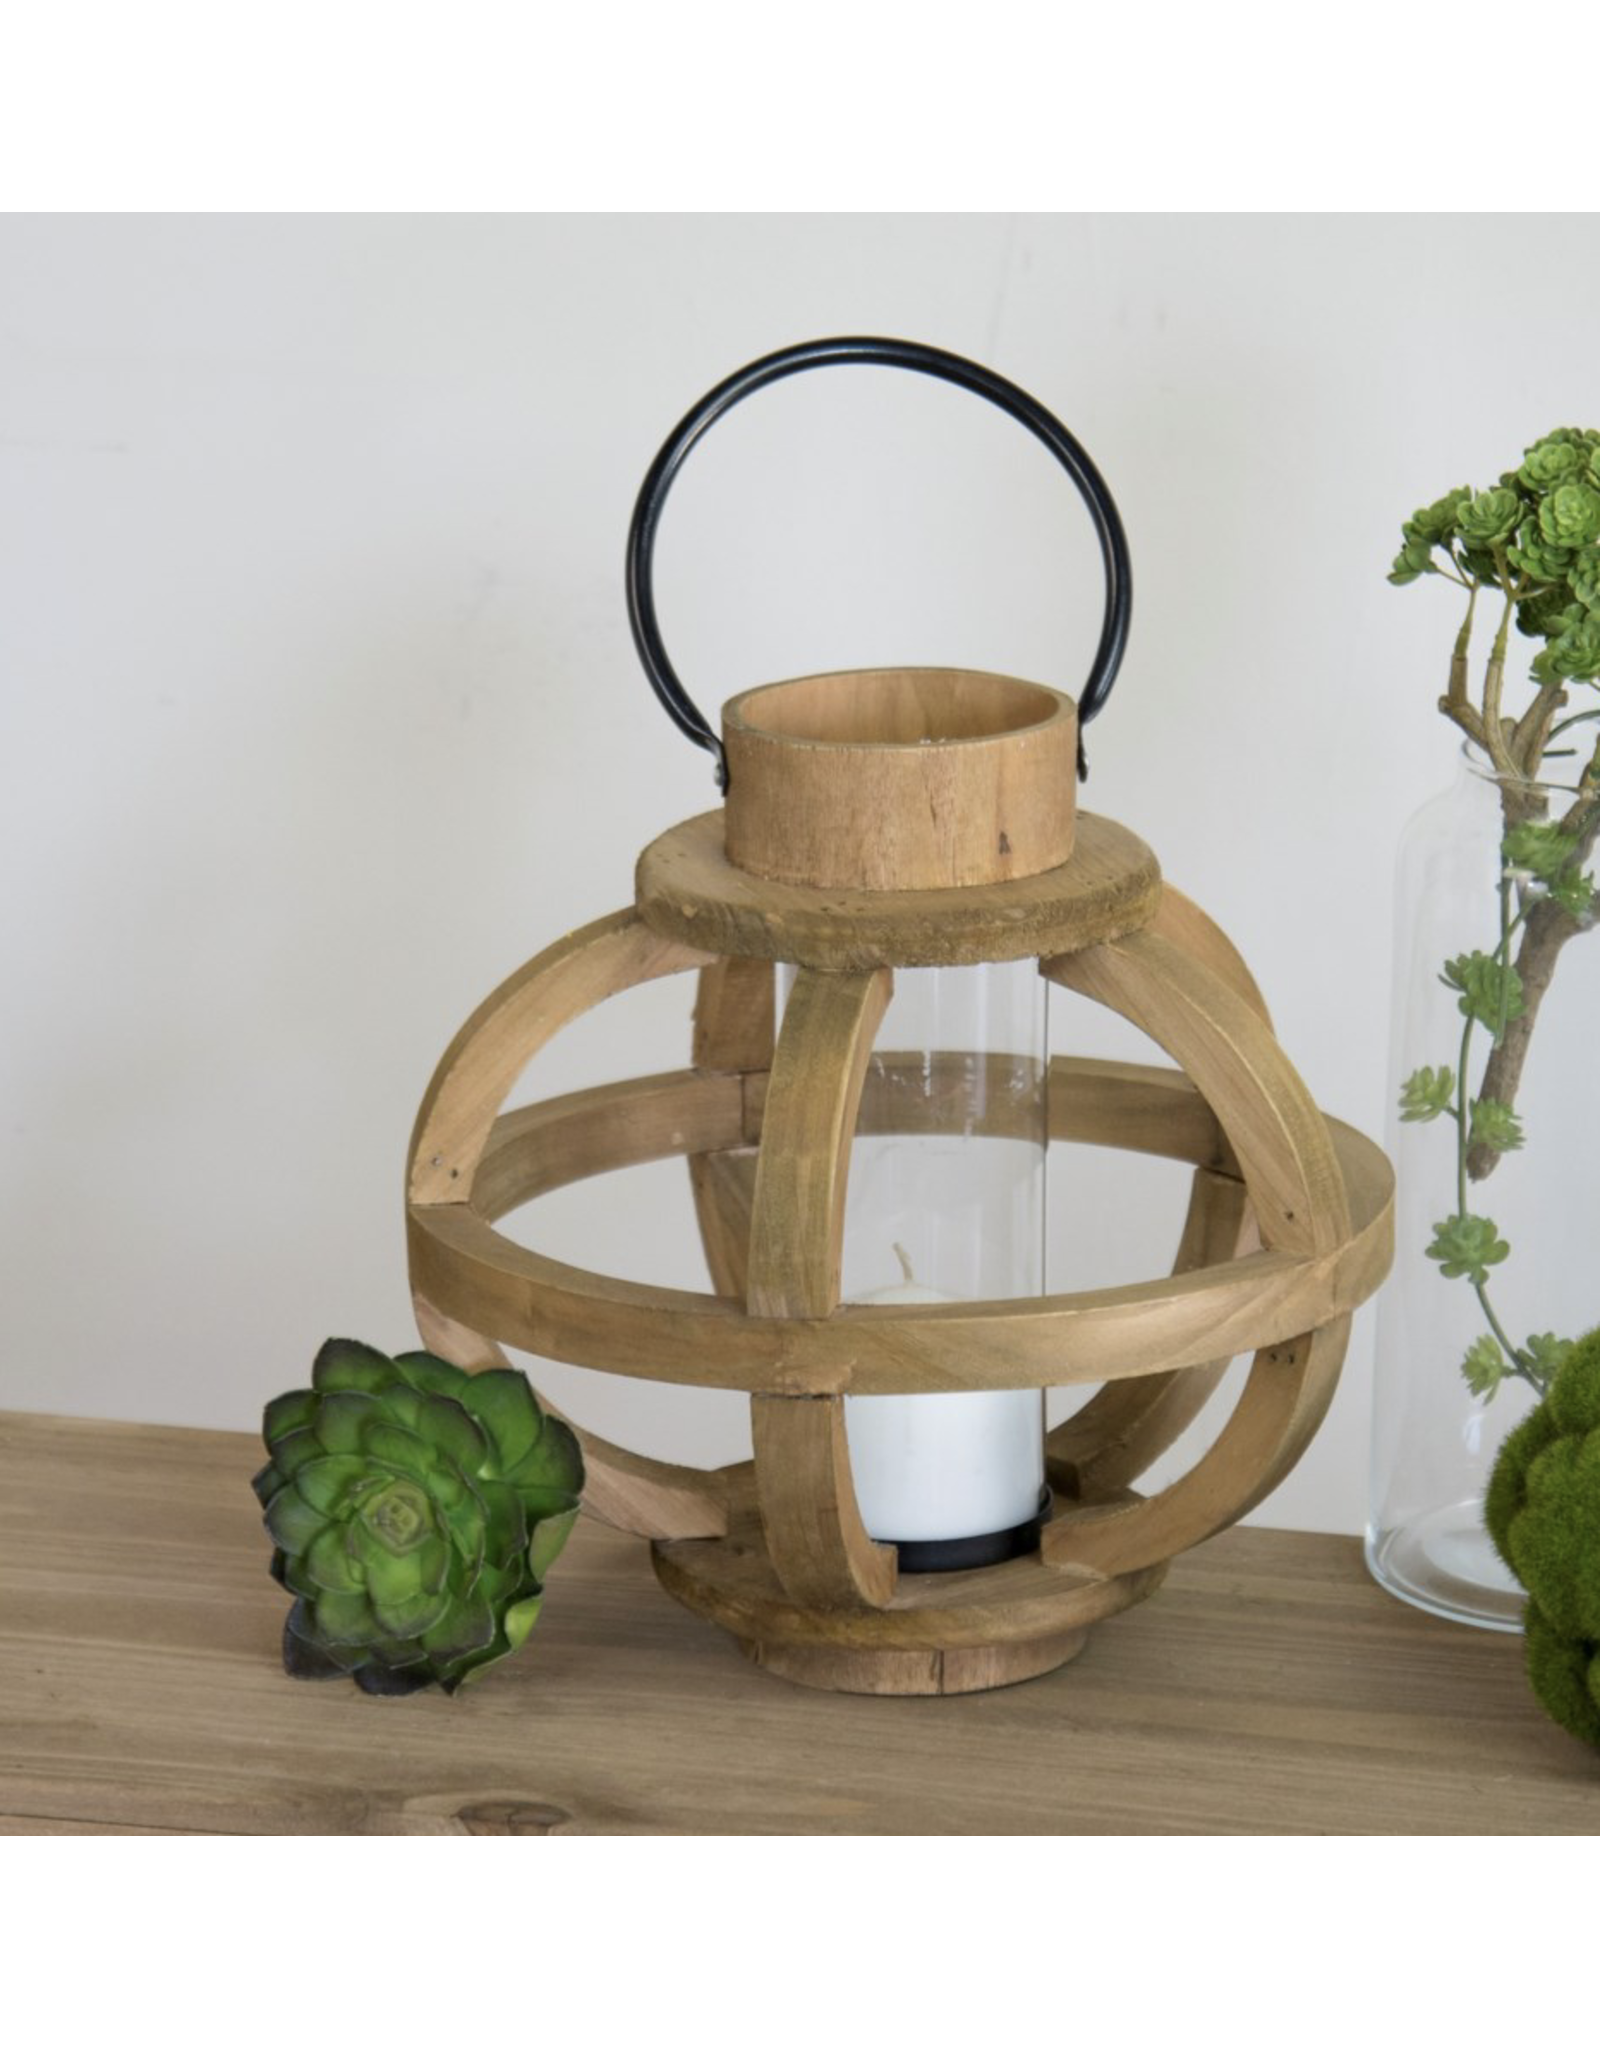 VIP Home & Garden Round Wood Candle Holder